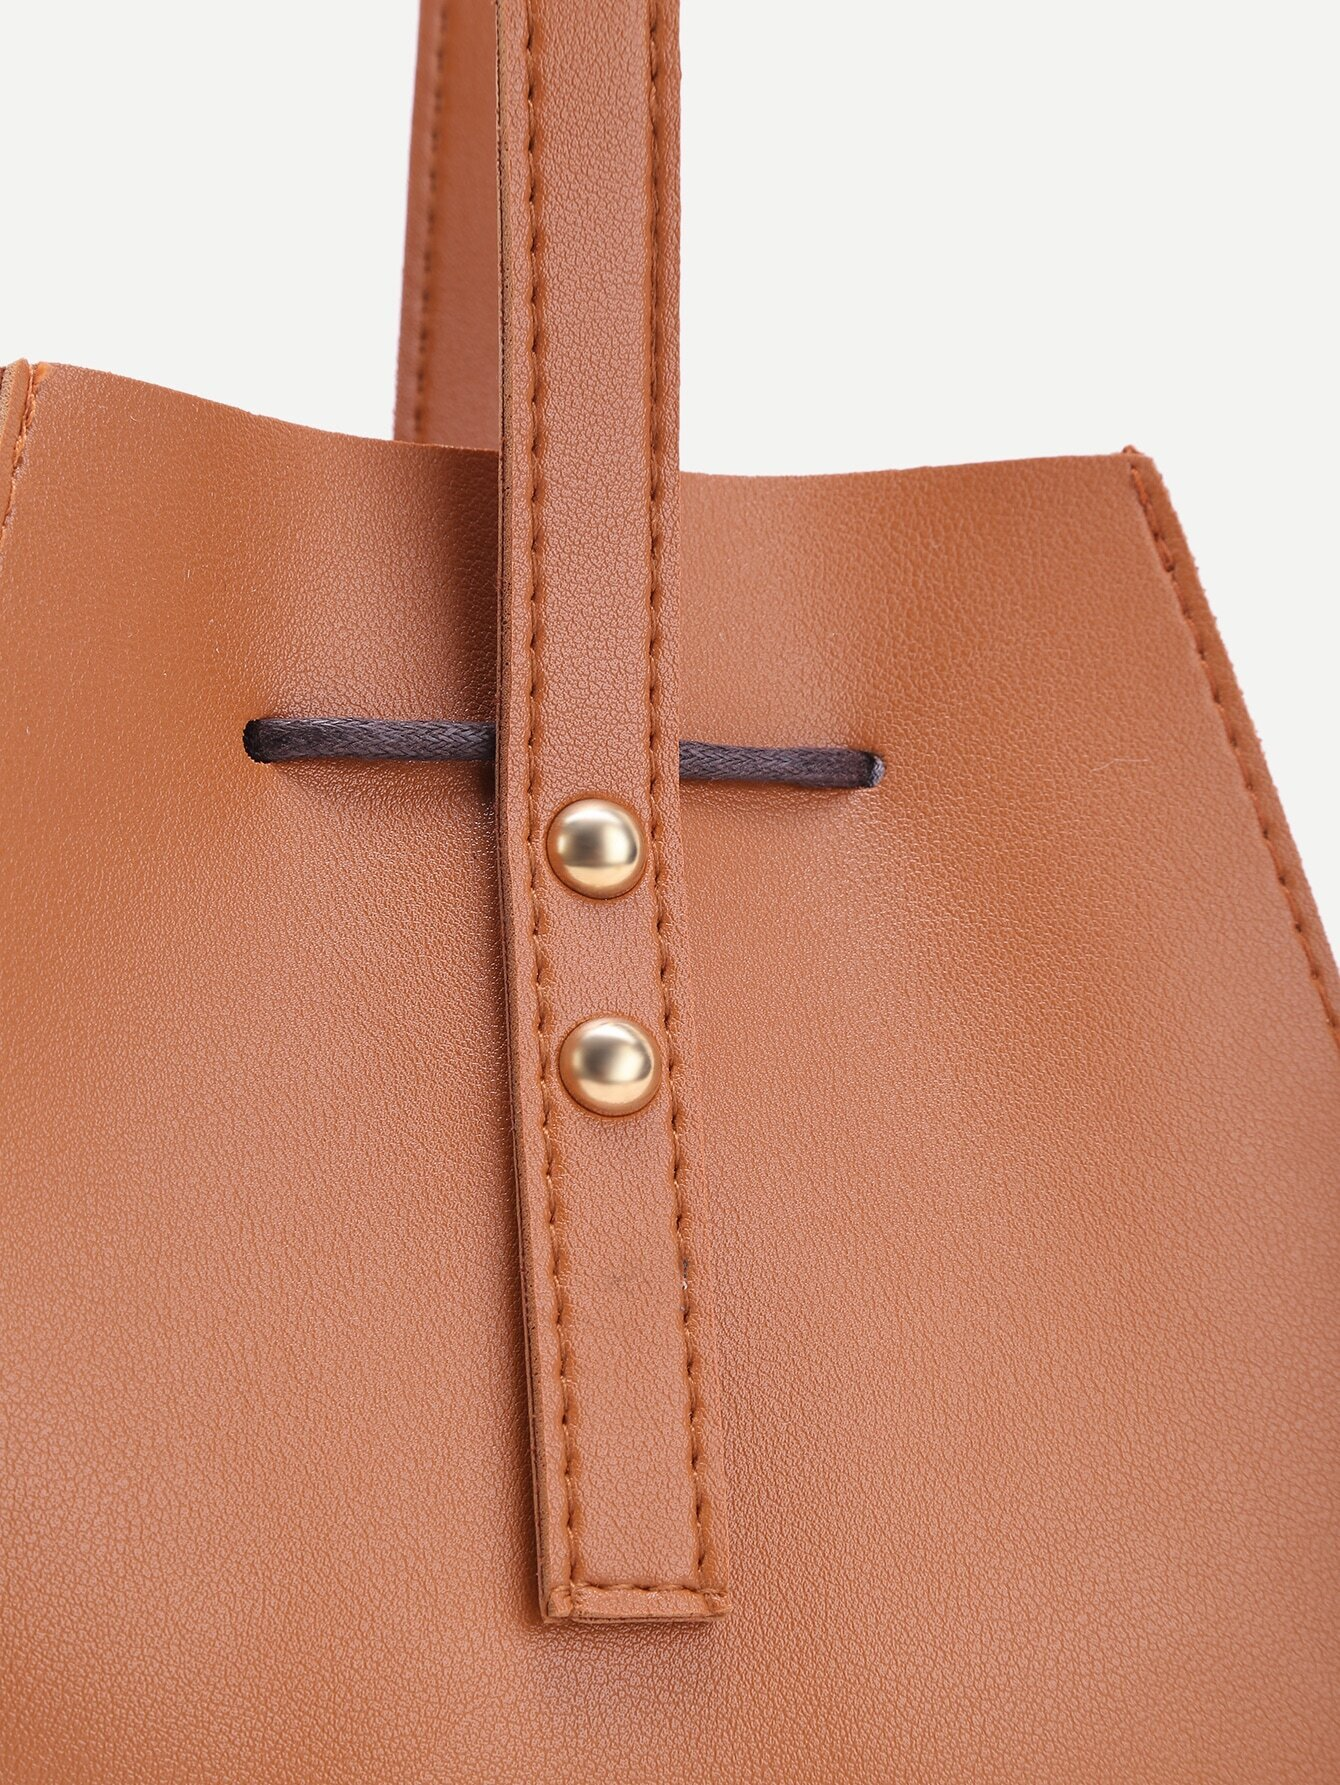 bag161007919_2